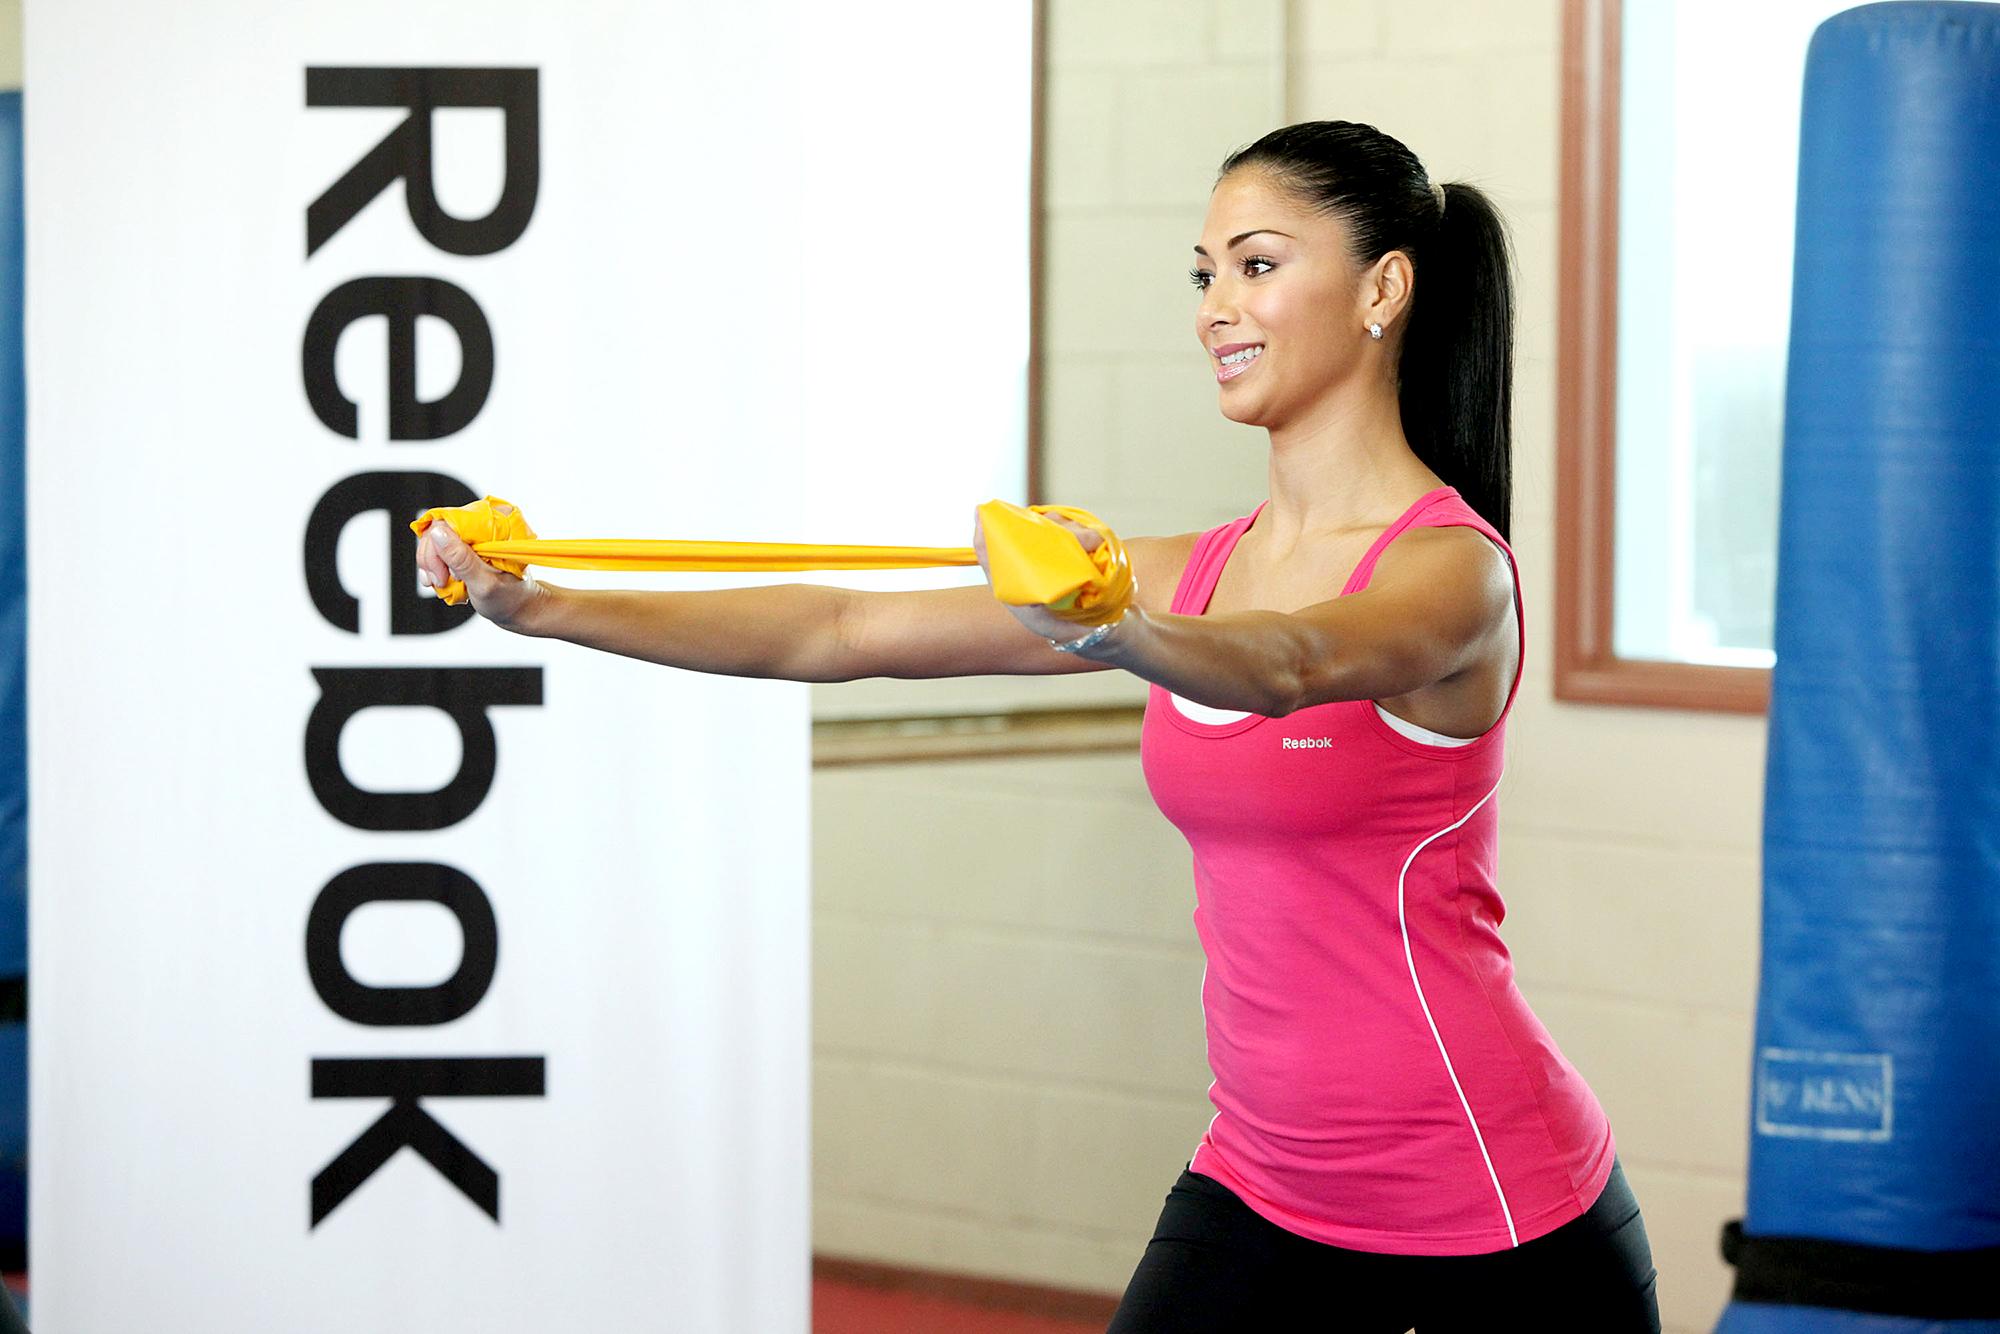 Nicole-Scherzinger-working-out - Nicole Scherzinger attends Reebok's Fit to Flex at the Fitness Factory.